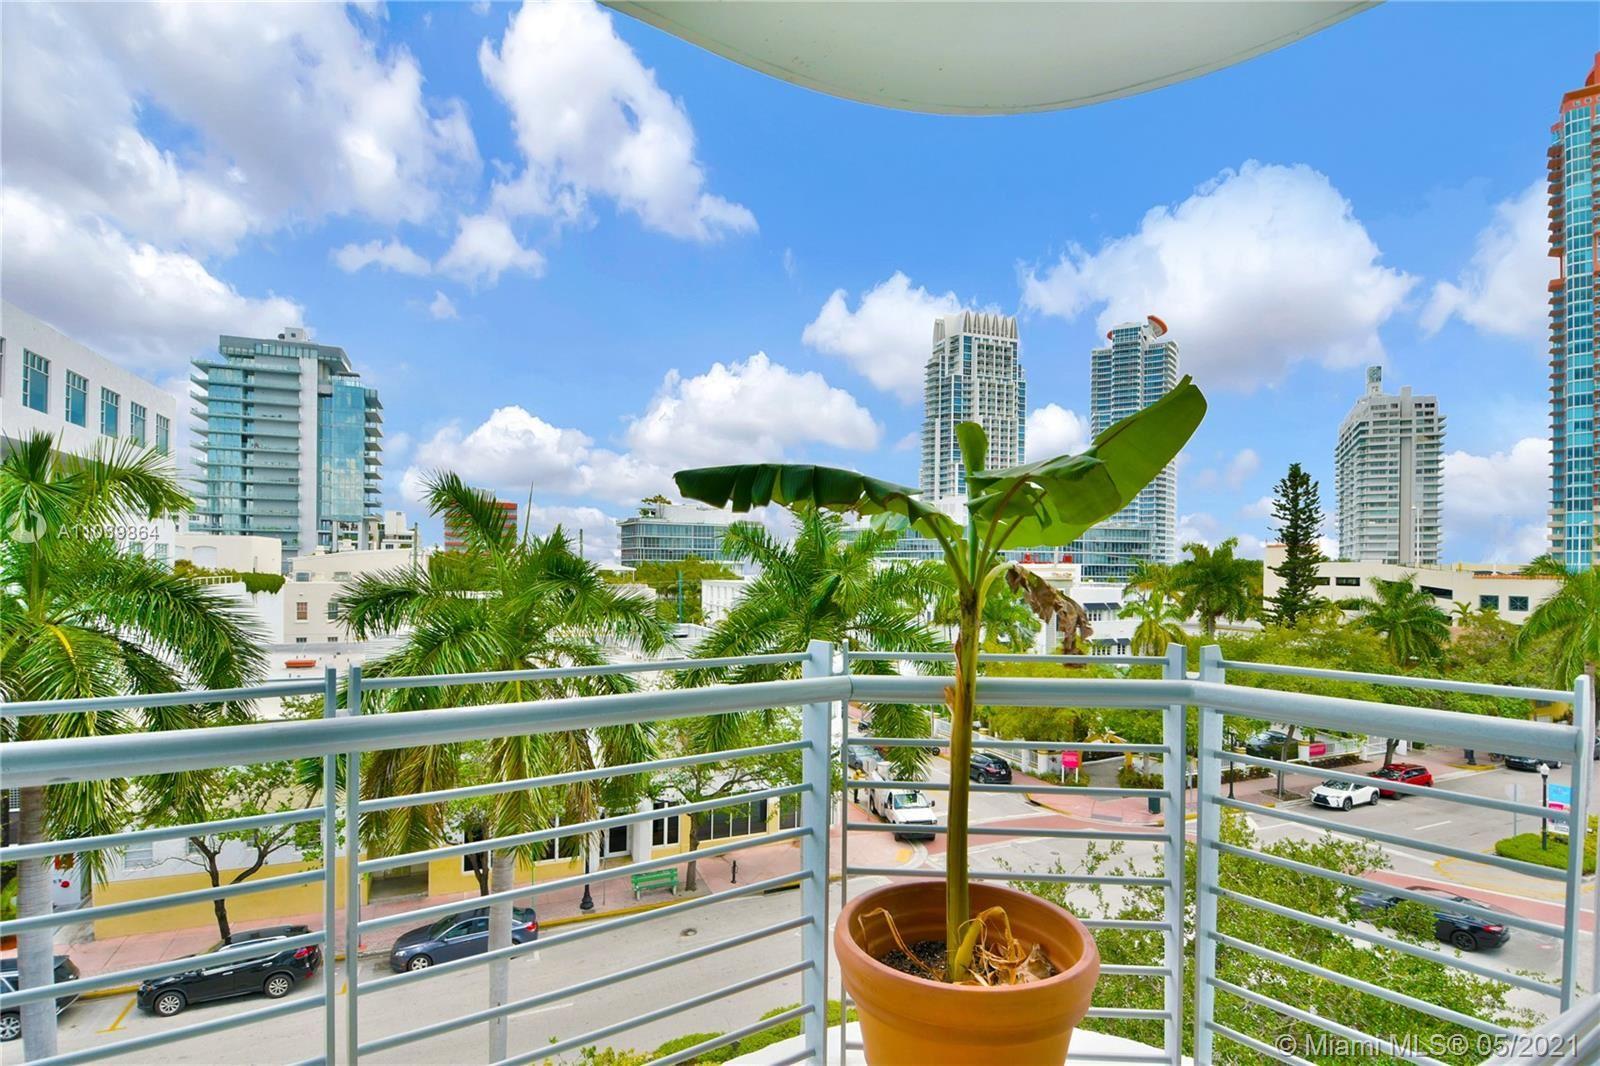 110 Washington Ave #1507, Miami Beach, FL 33139 - #: A11039864